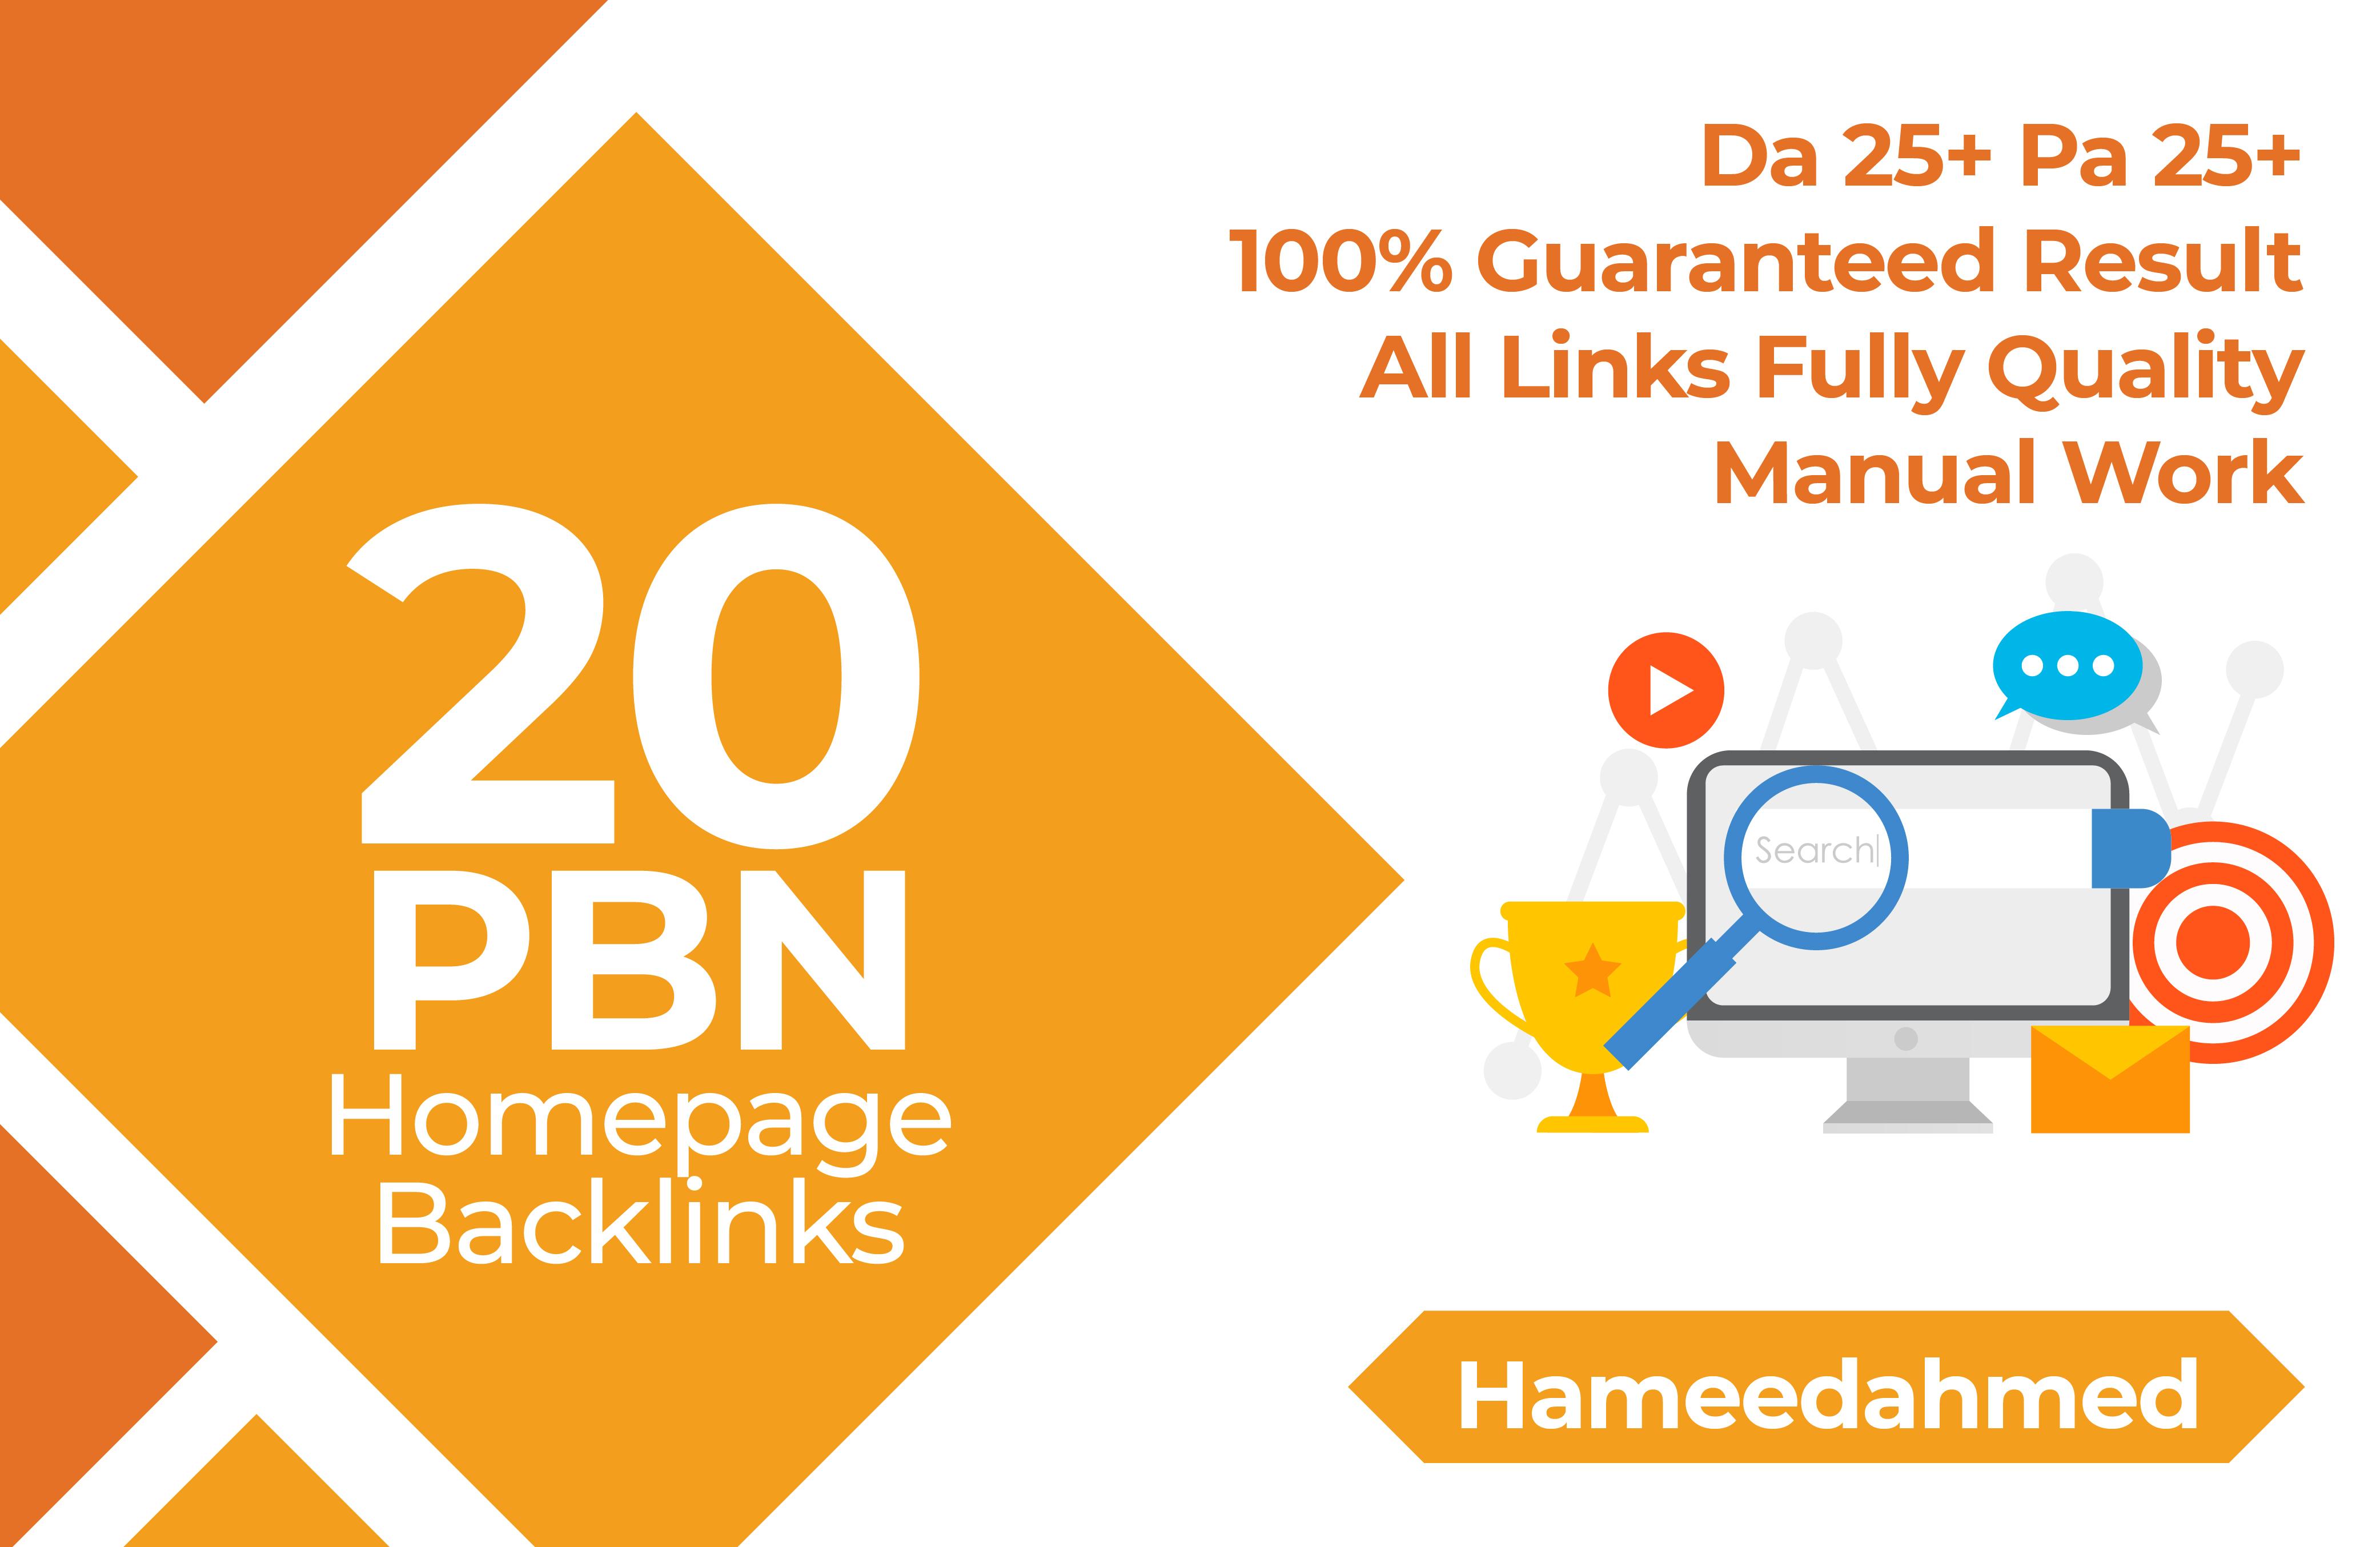 proivde 20 Manual High DA25+ PA 25 Plus Homepage PBN Dofollow Backlinks